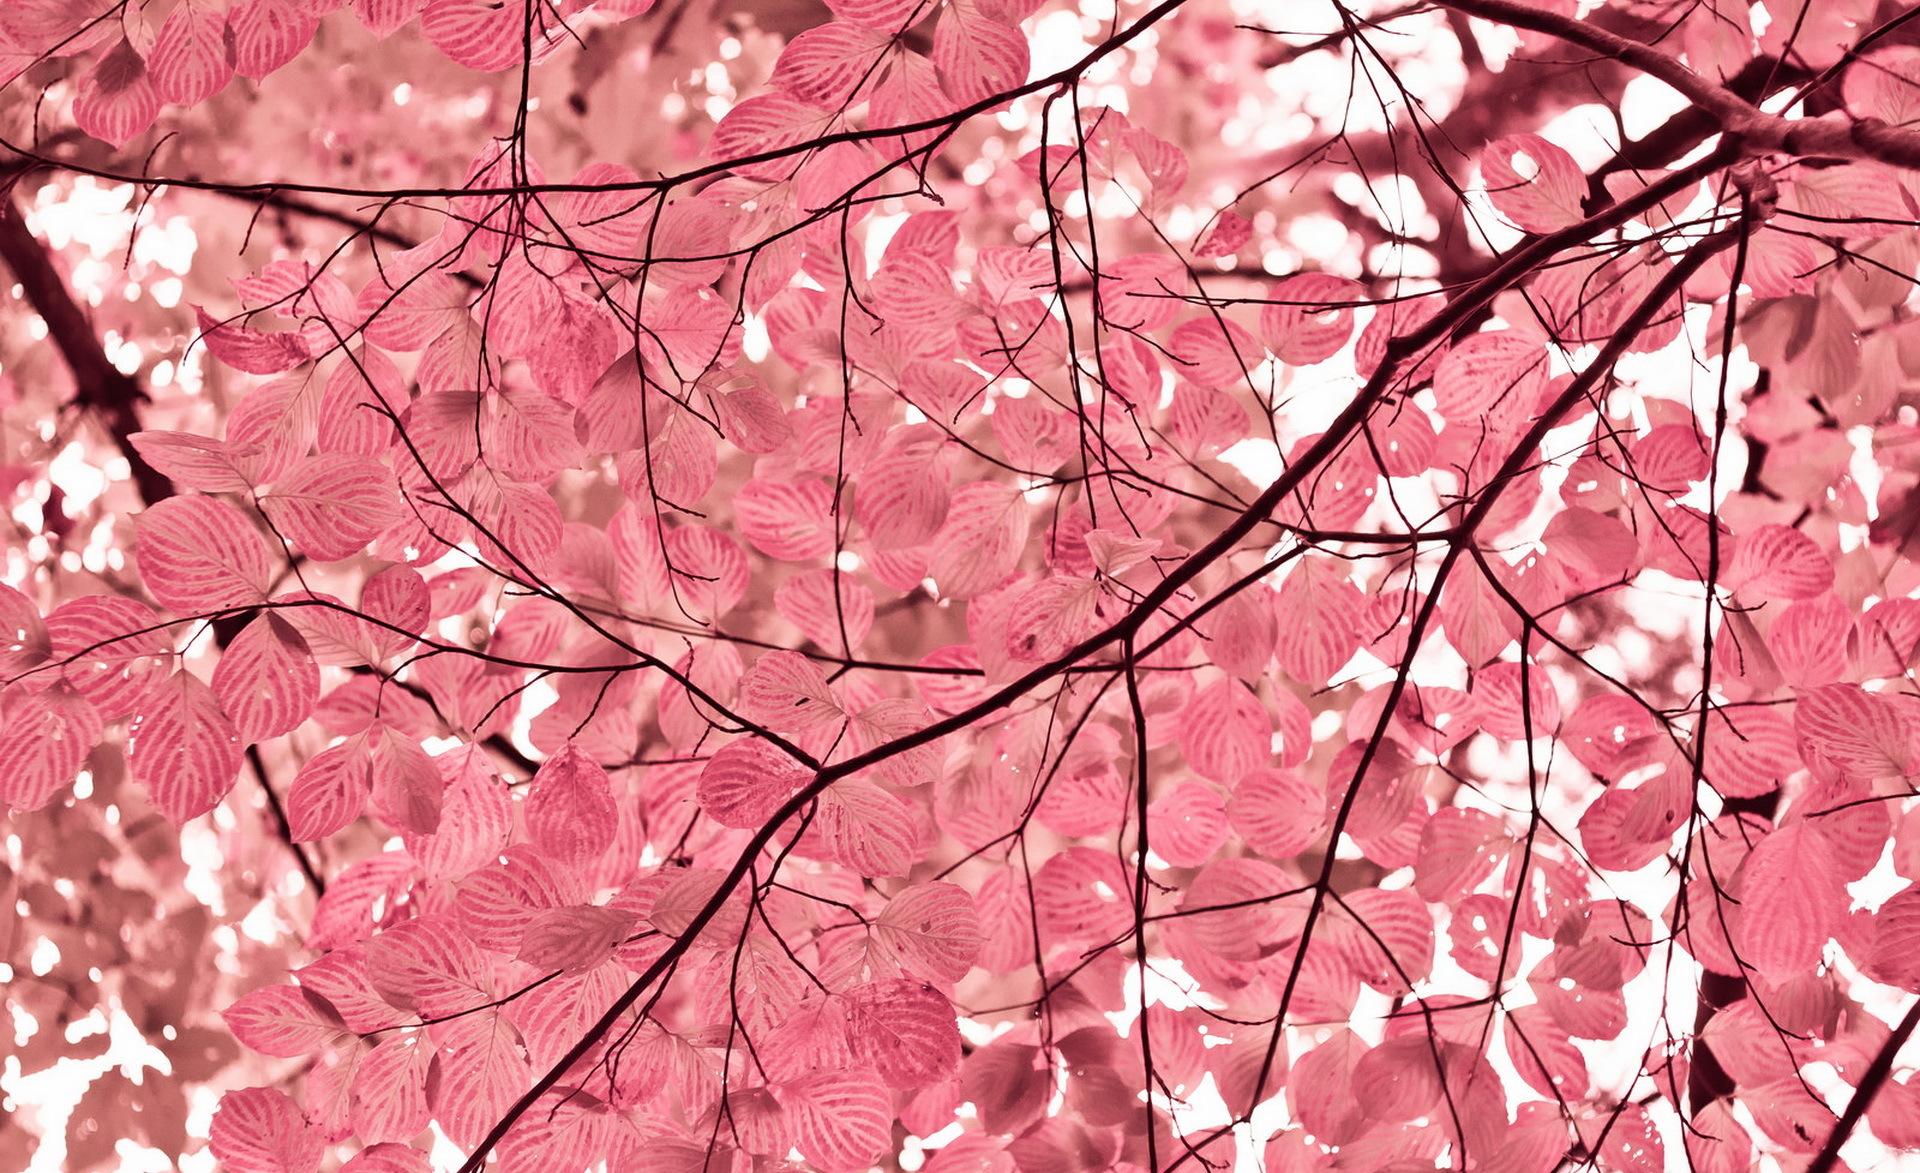 Fondos De Patalla: Pink Leaves Fondo De Pantalla HD